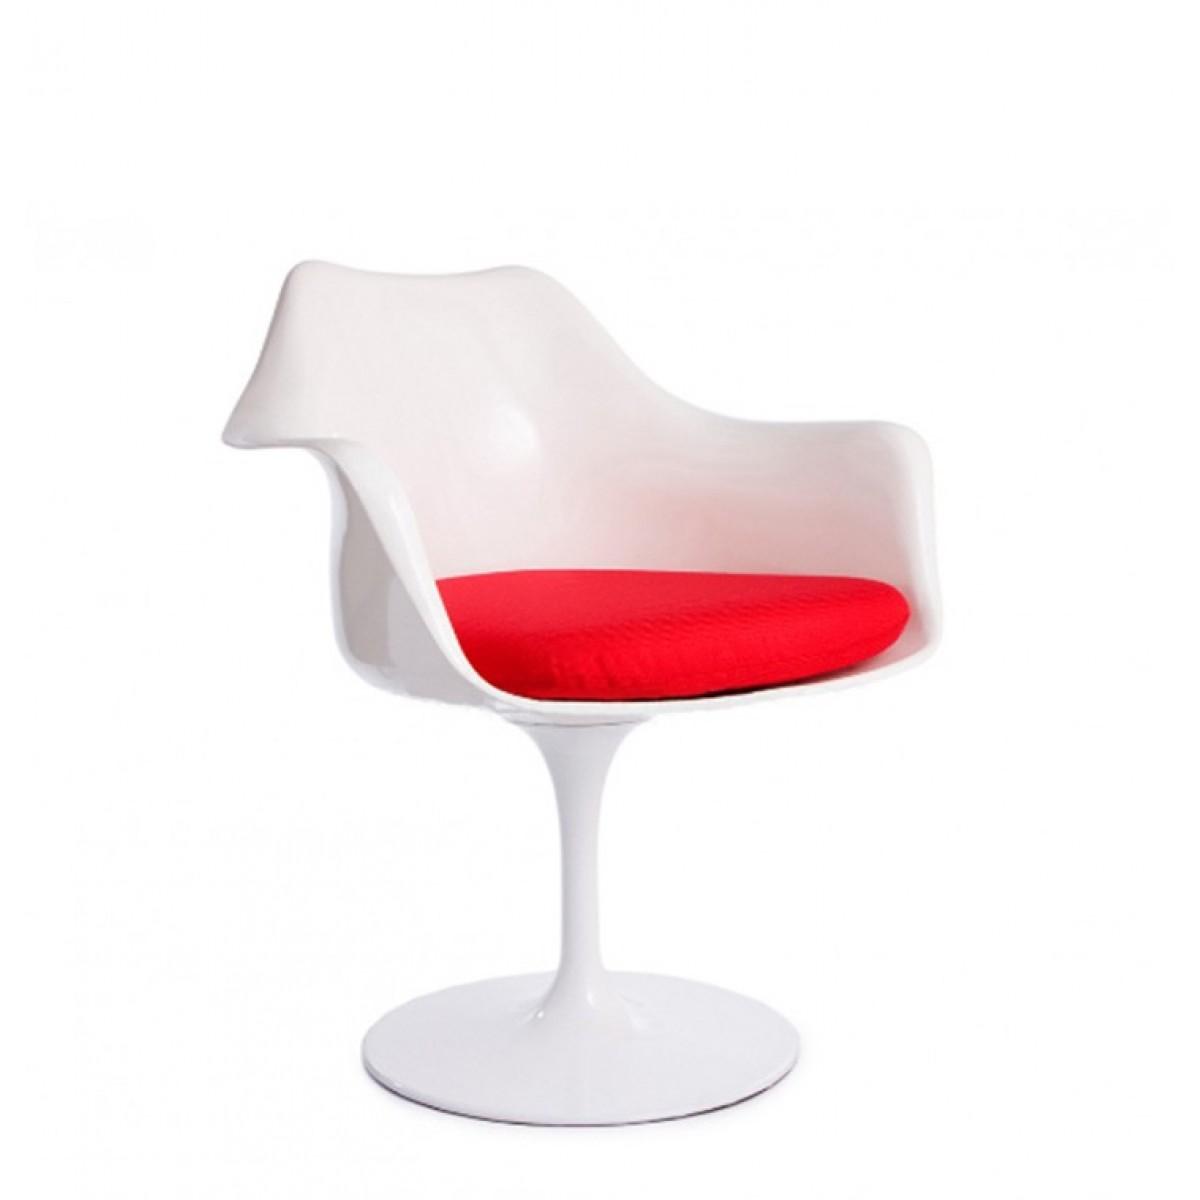 tulip table and chairs uk satin chair covers rental inc eero saarinen style arm white replica